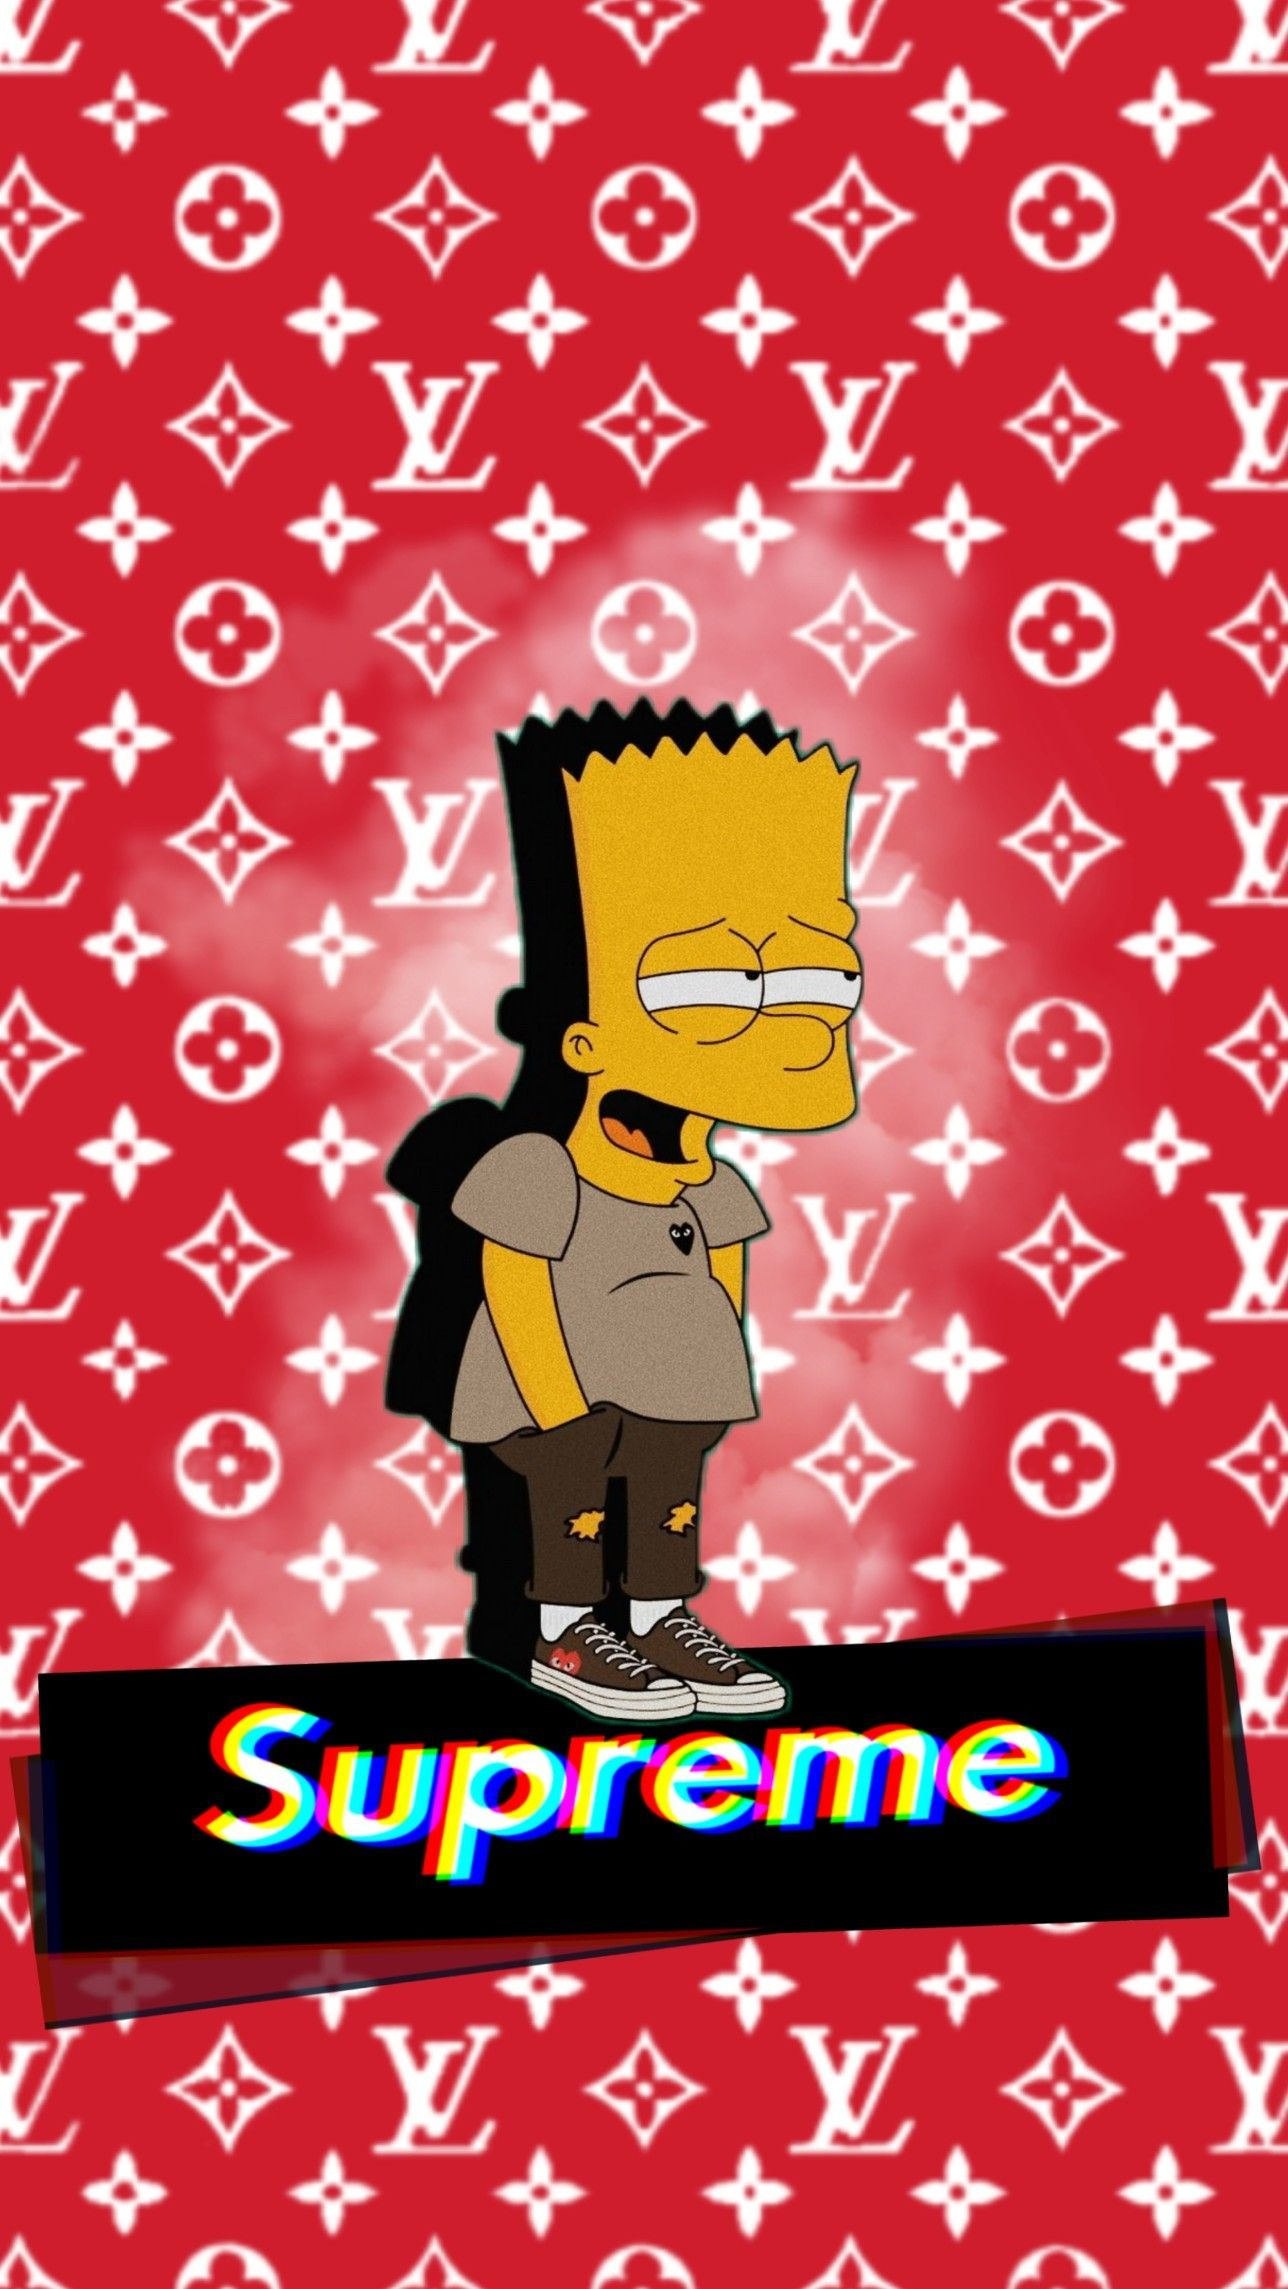 Supreme Wallpaper Cartoon Wallpaper Iphone Simpson Wallpaper Iphone Supreme Iphone Wallpaper